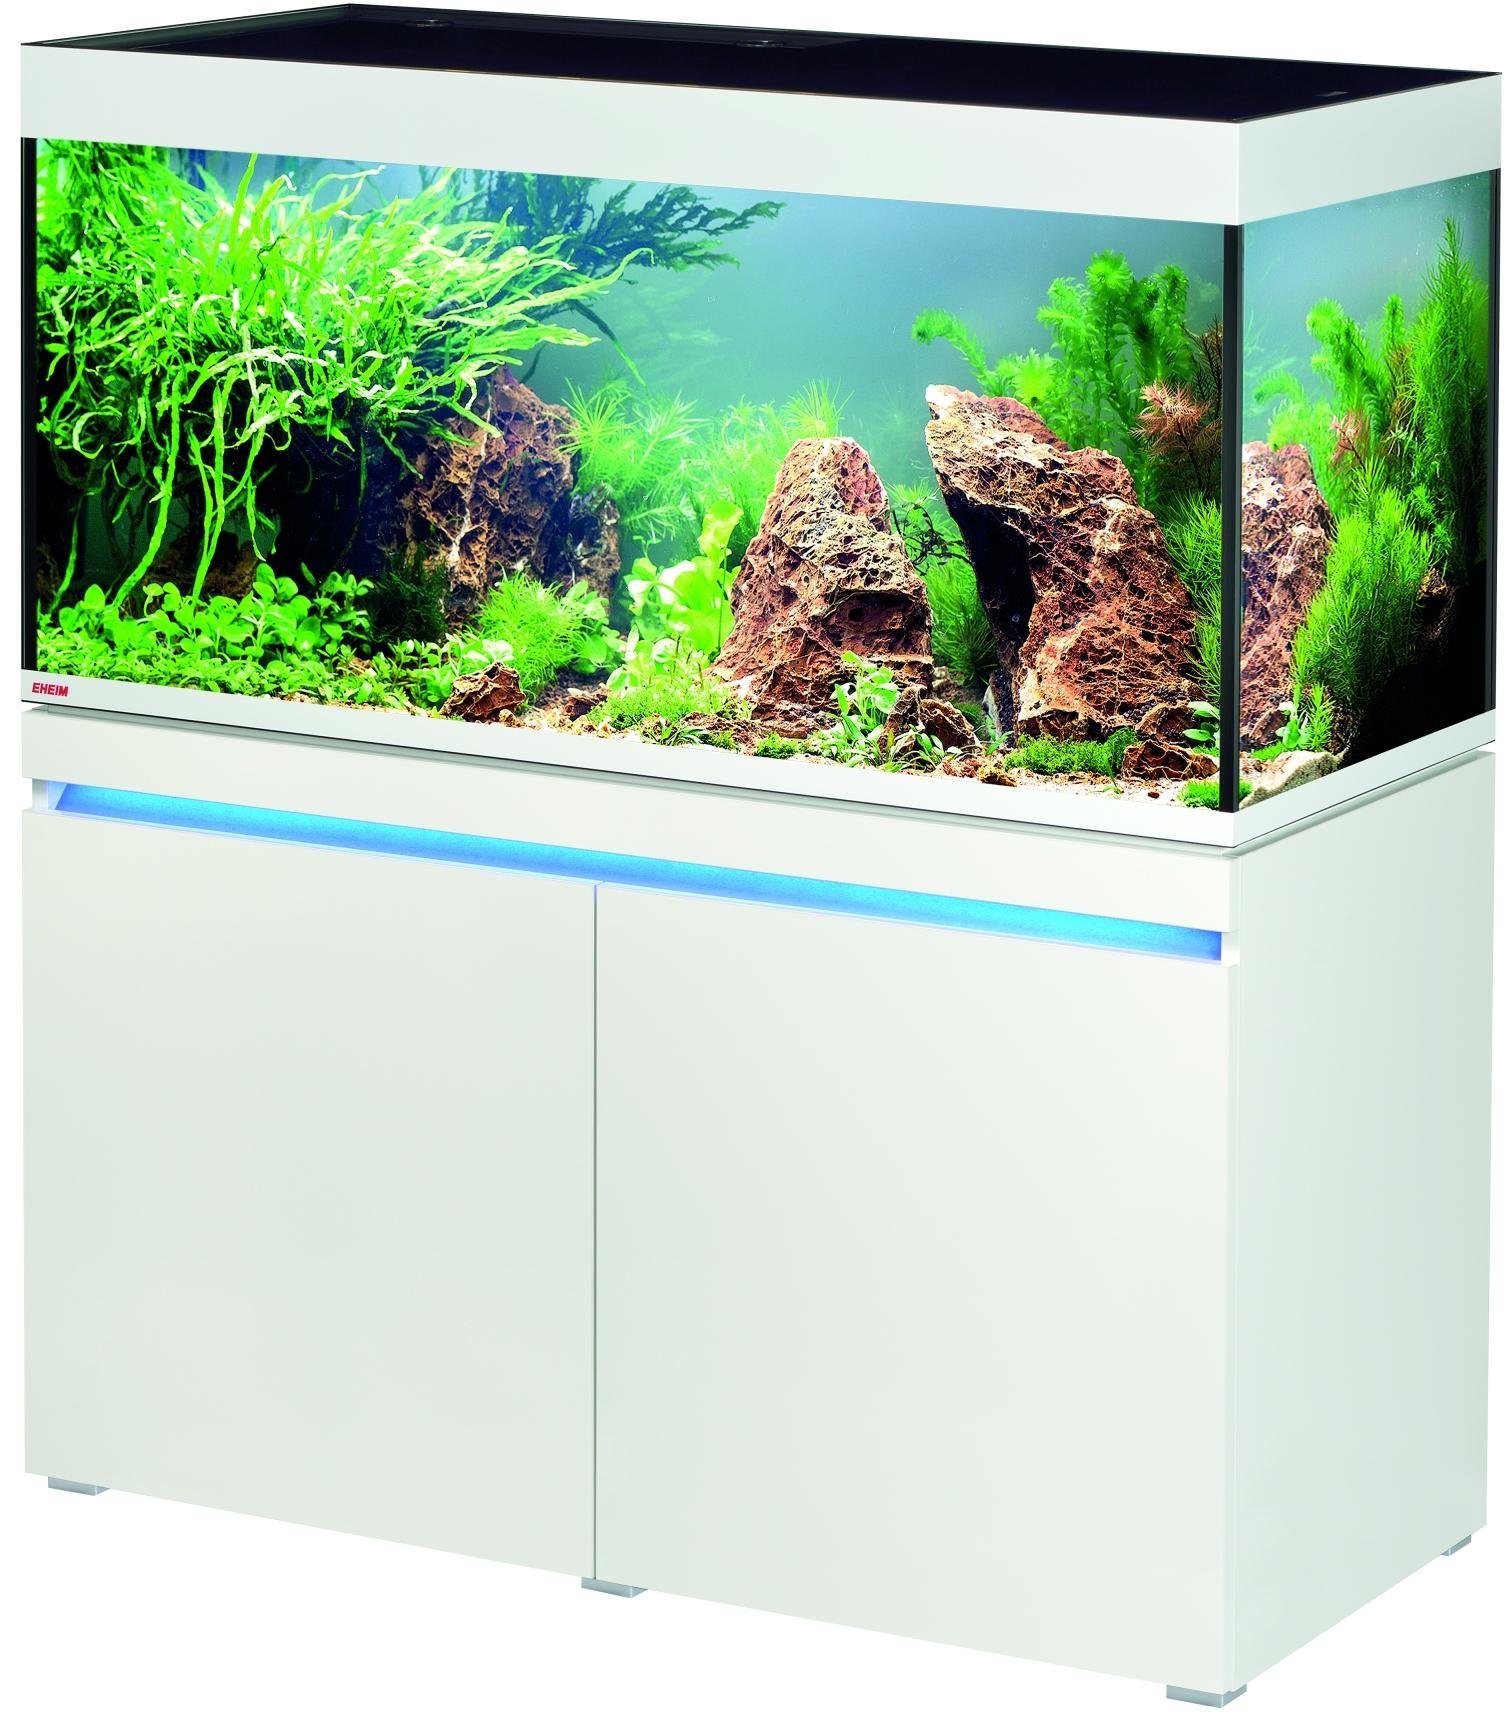 Bekannt EHEIM Aquarium Combination incpiria 430 CN56